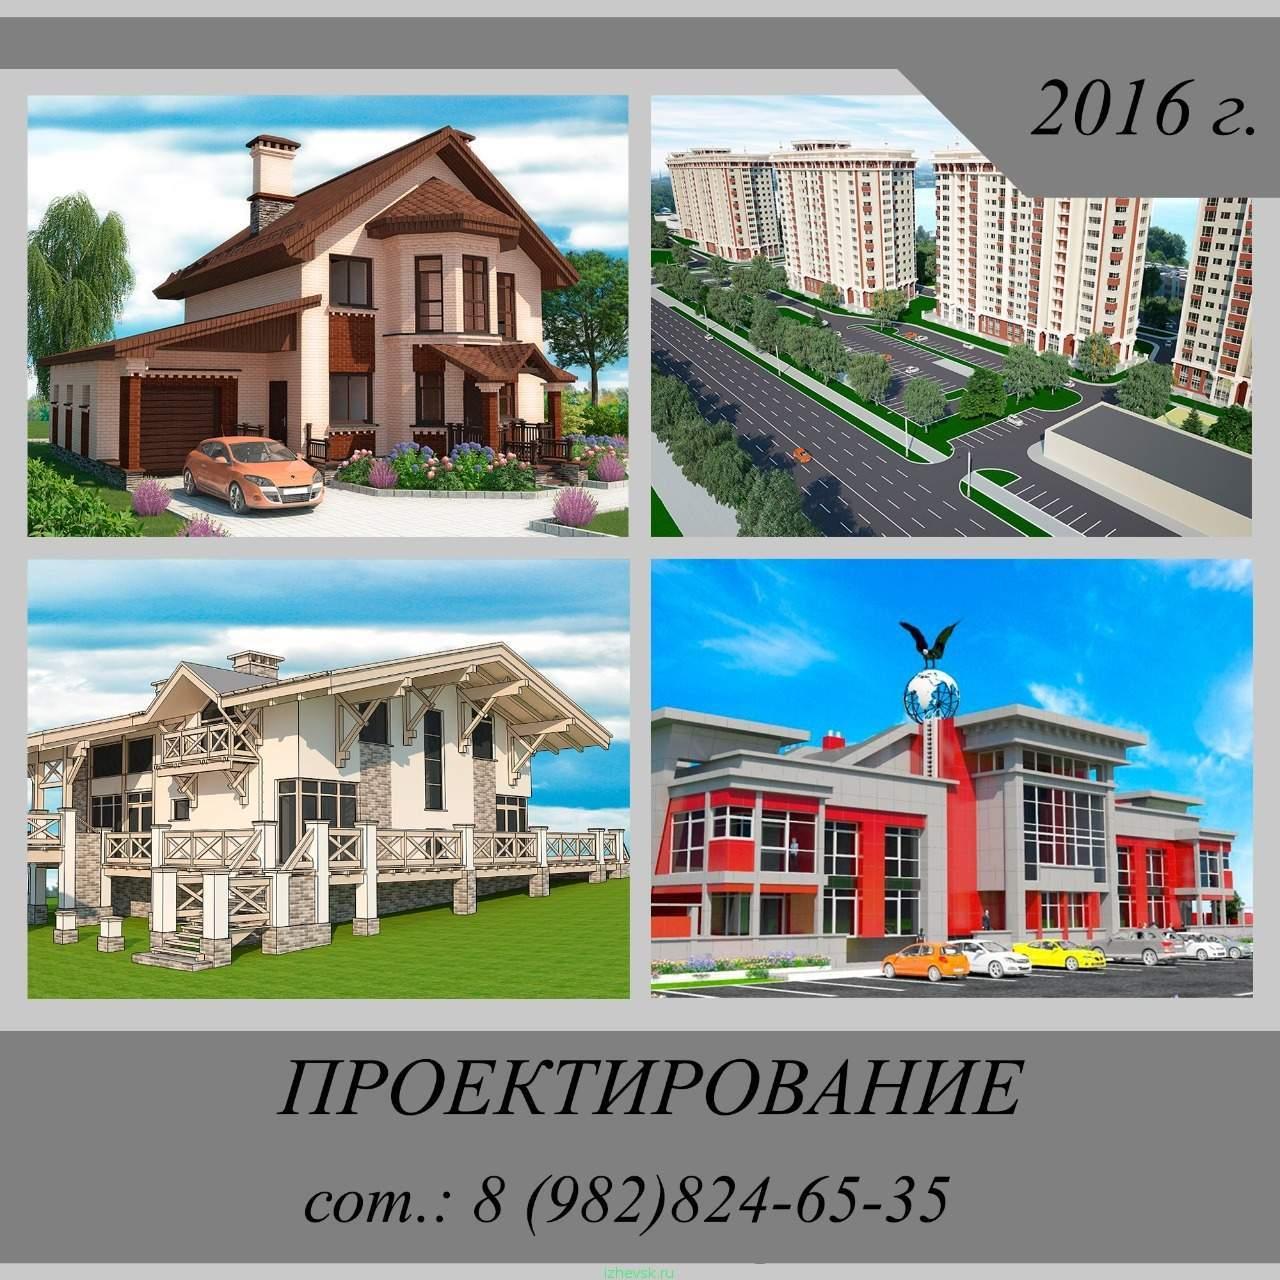 www ufms spb ru бланки